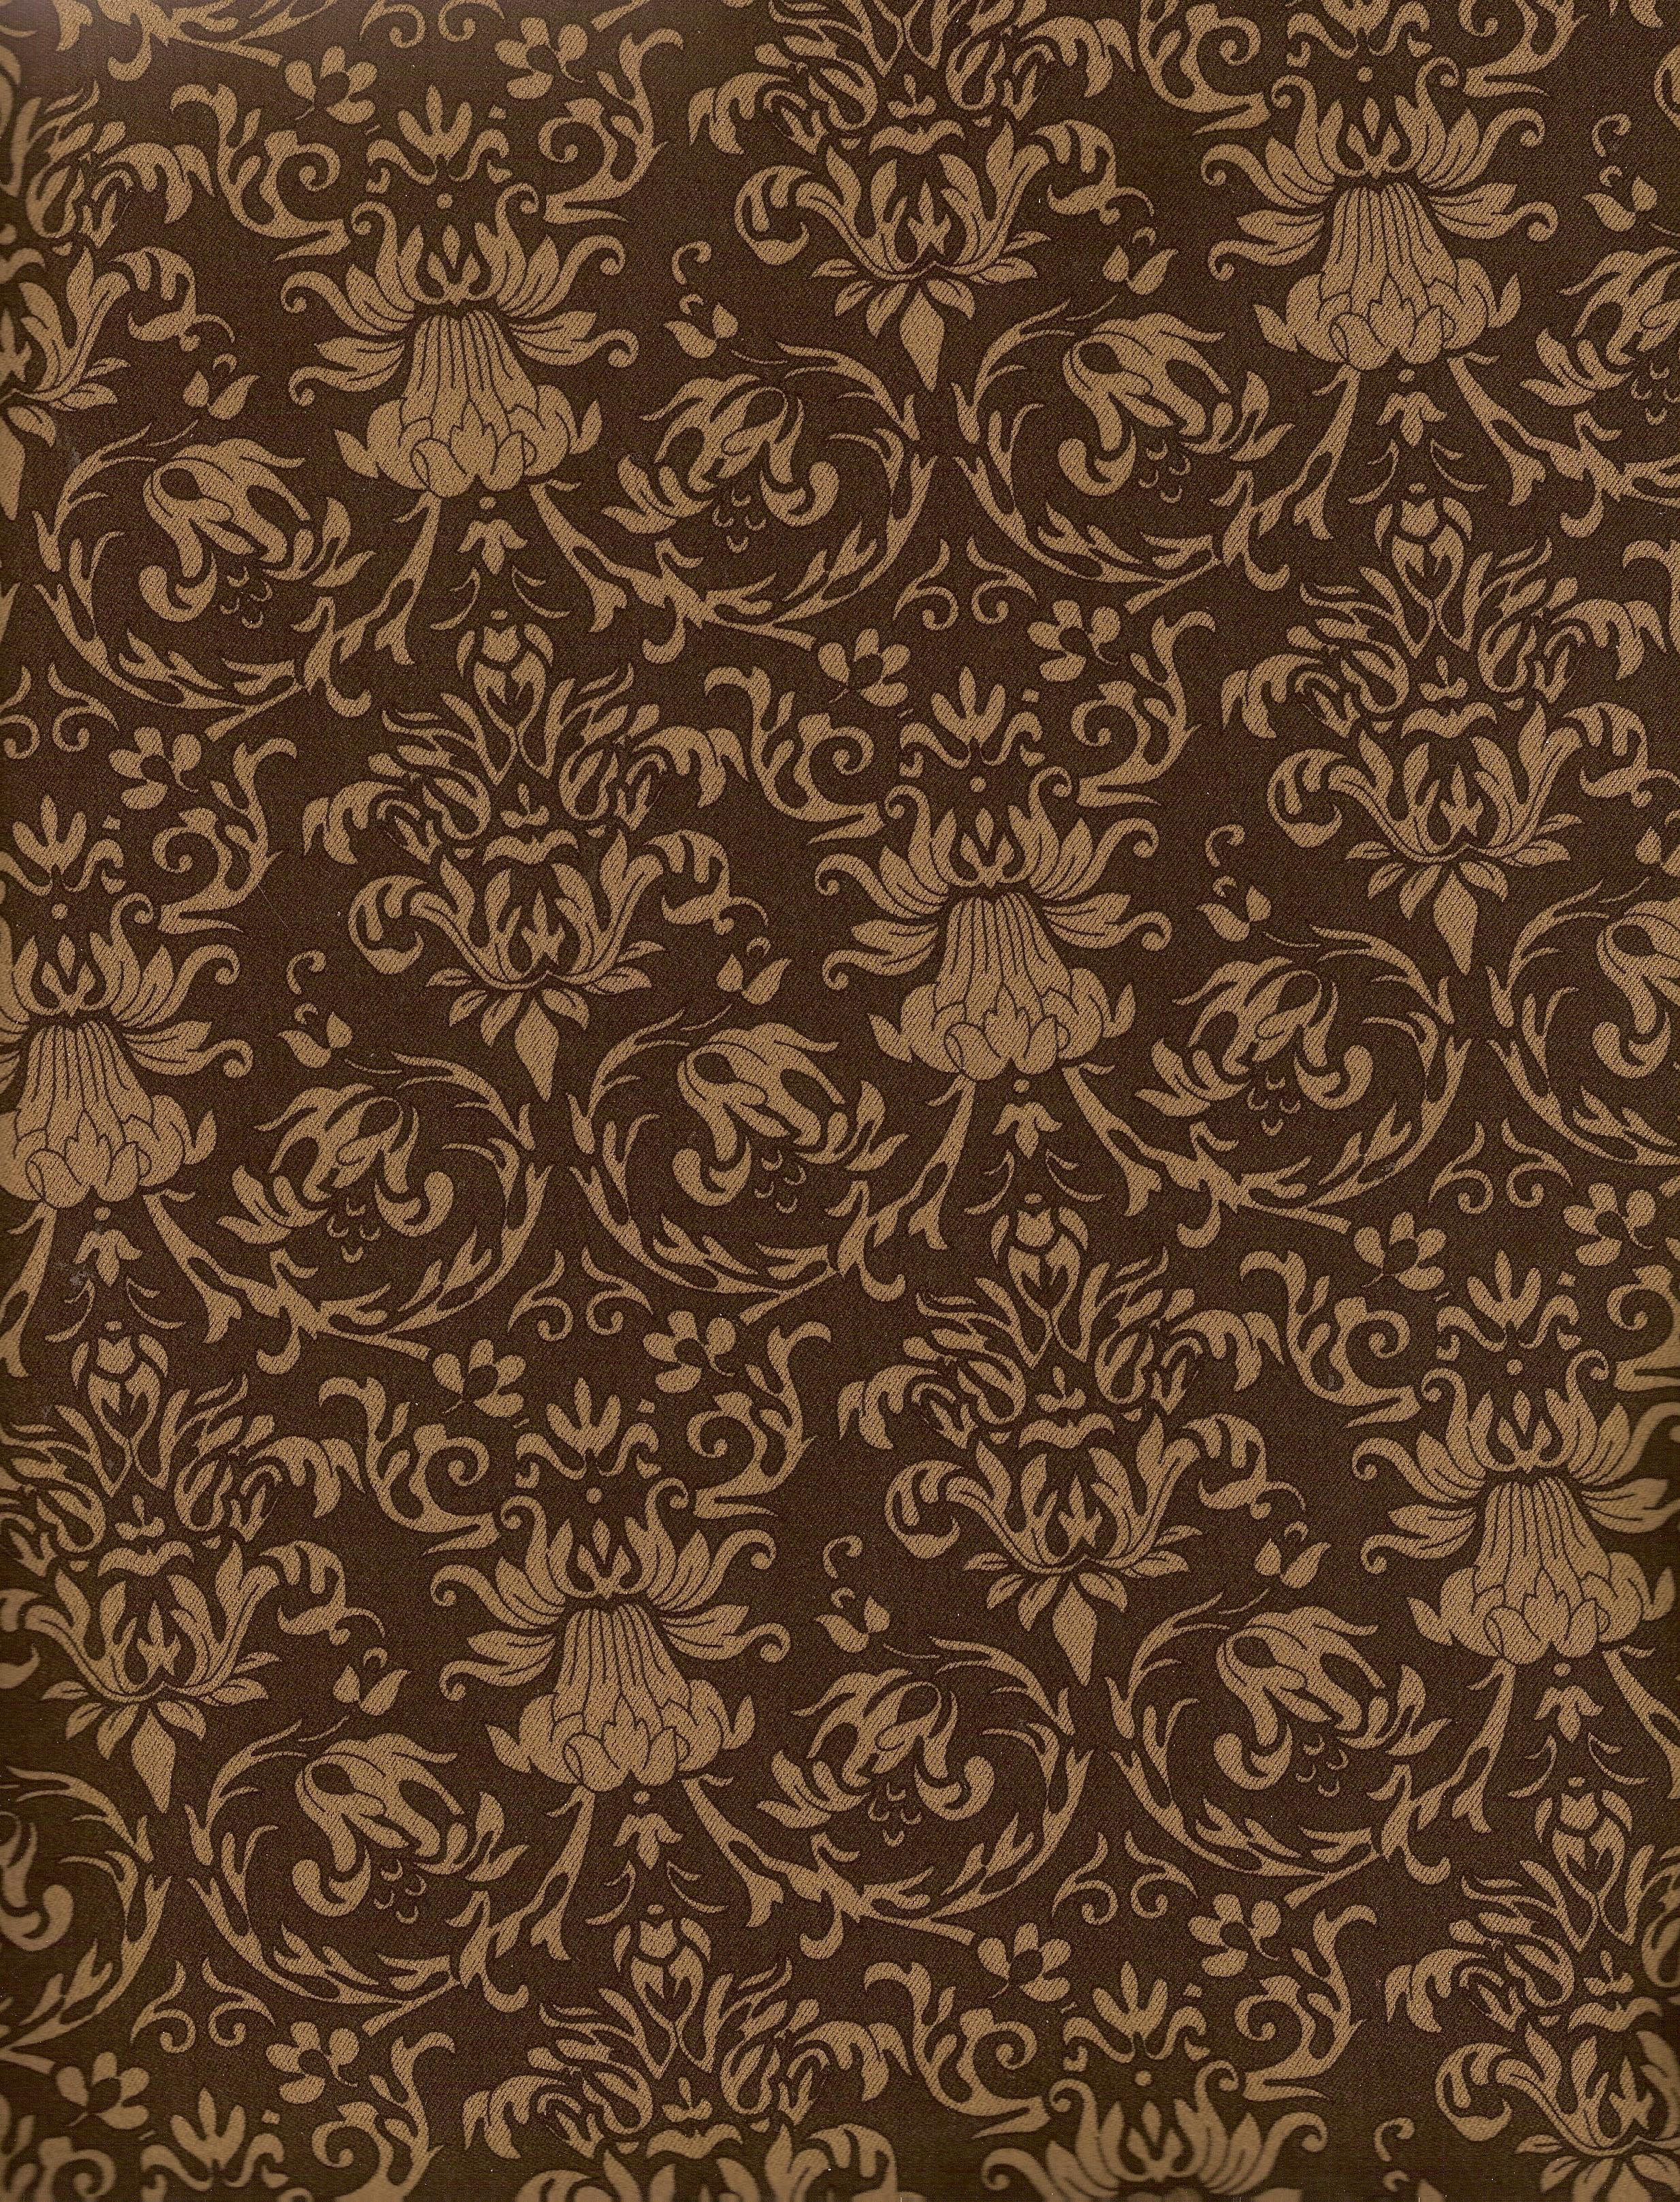 Art_Nouveau_Pattern_Texture_by_Enchantedgal_Stock.jpg